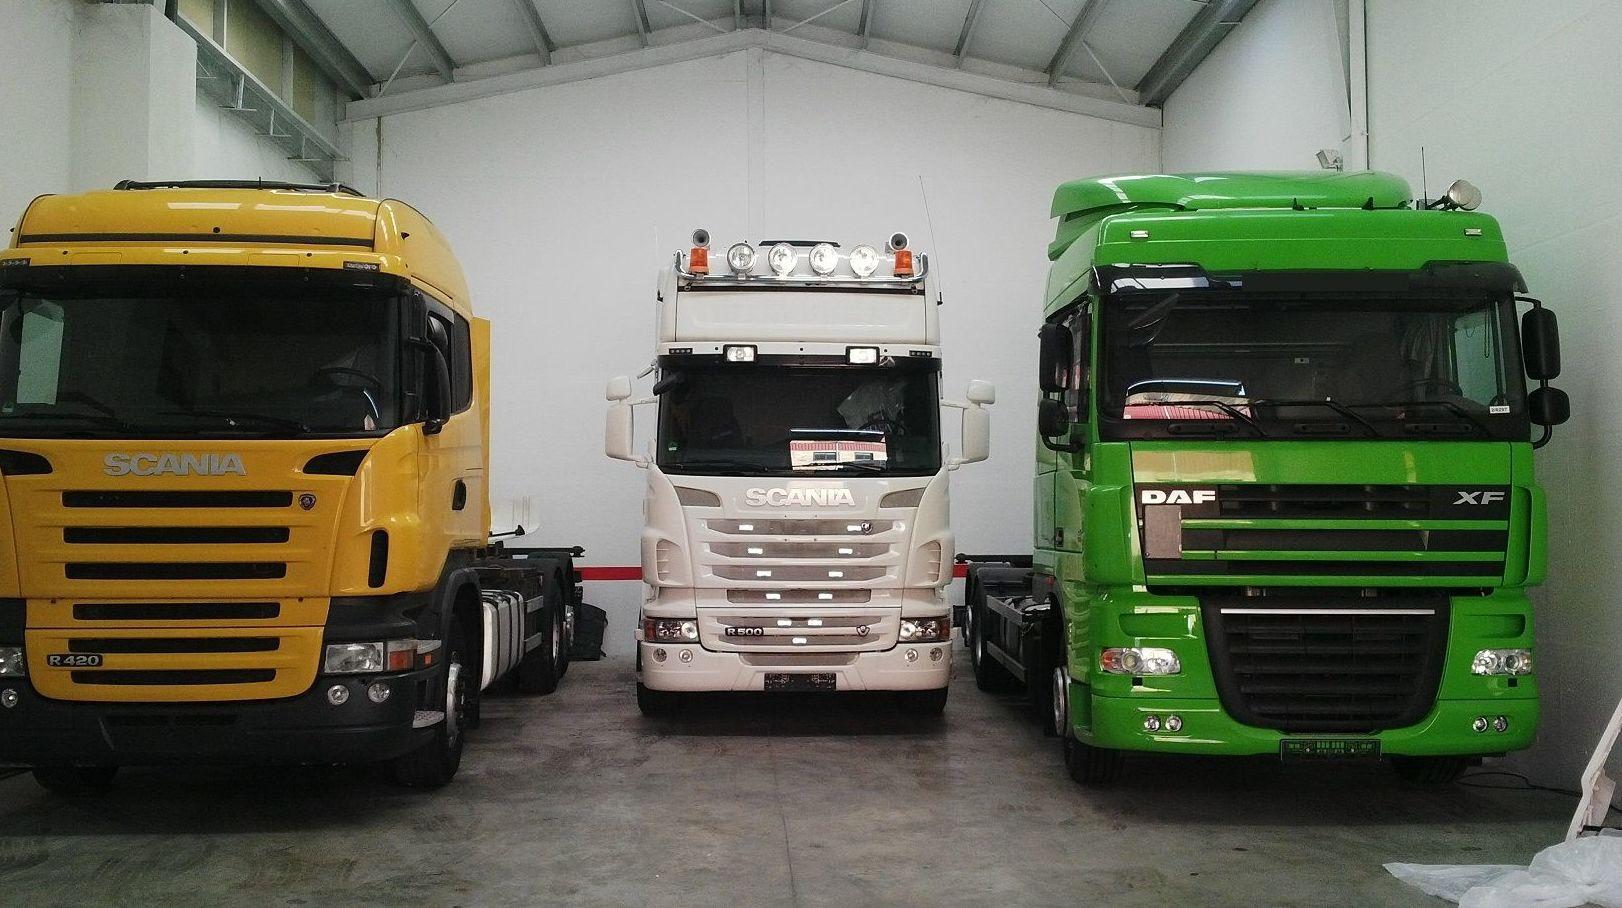 Foto 22 de Camiones en Villares de la Reina | Autotruck Salamanca